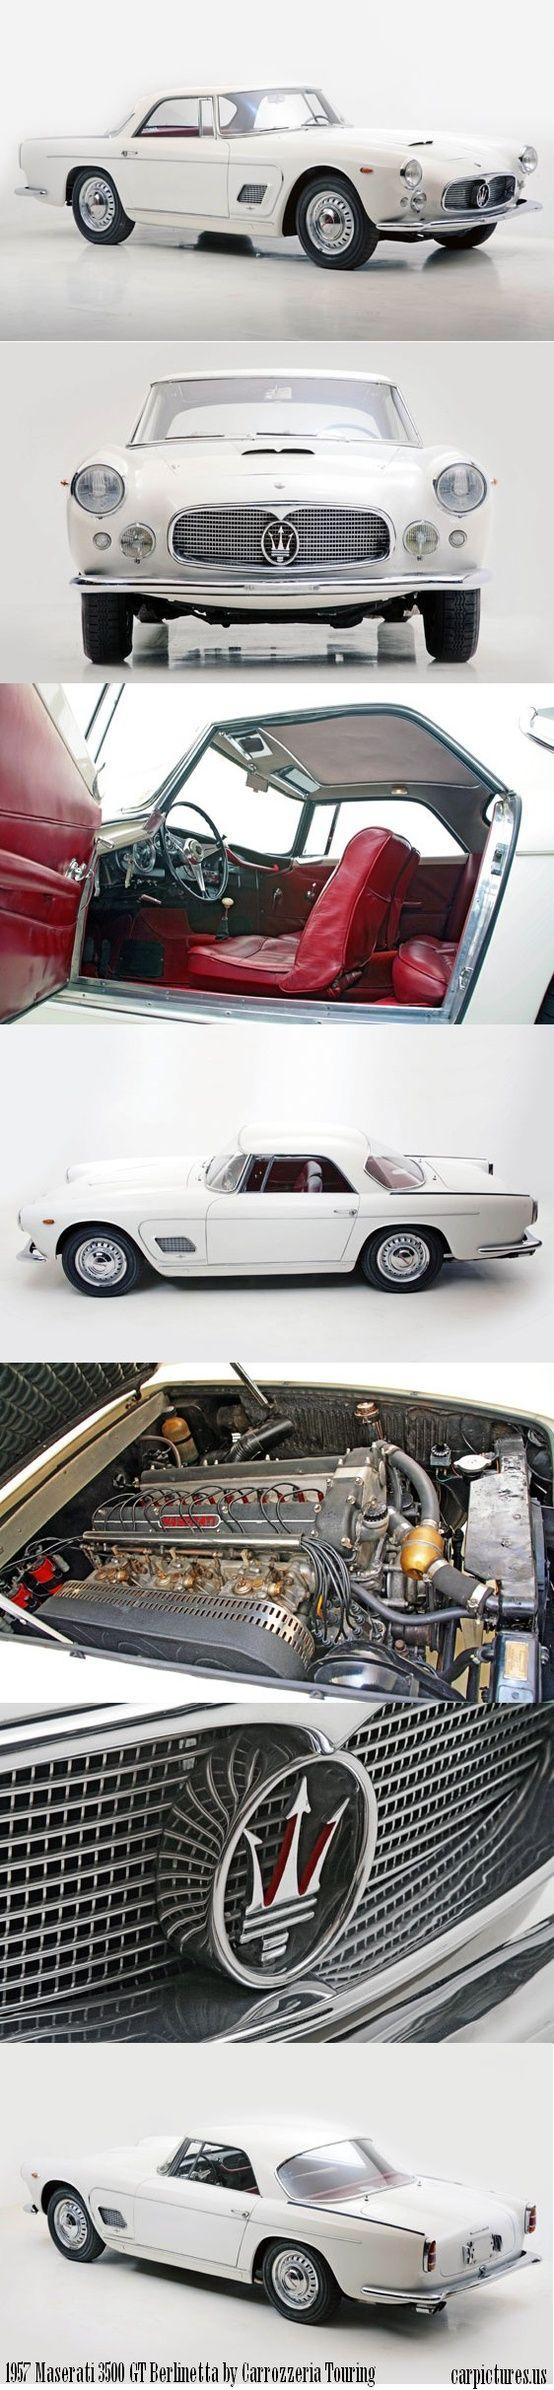 Cool Cars 1957 Maserati 3500 G ~ Aurora Bola Photo Blog – Cool Cars Photo daniel…